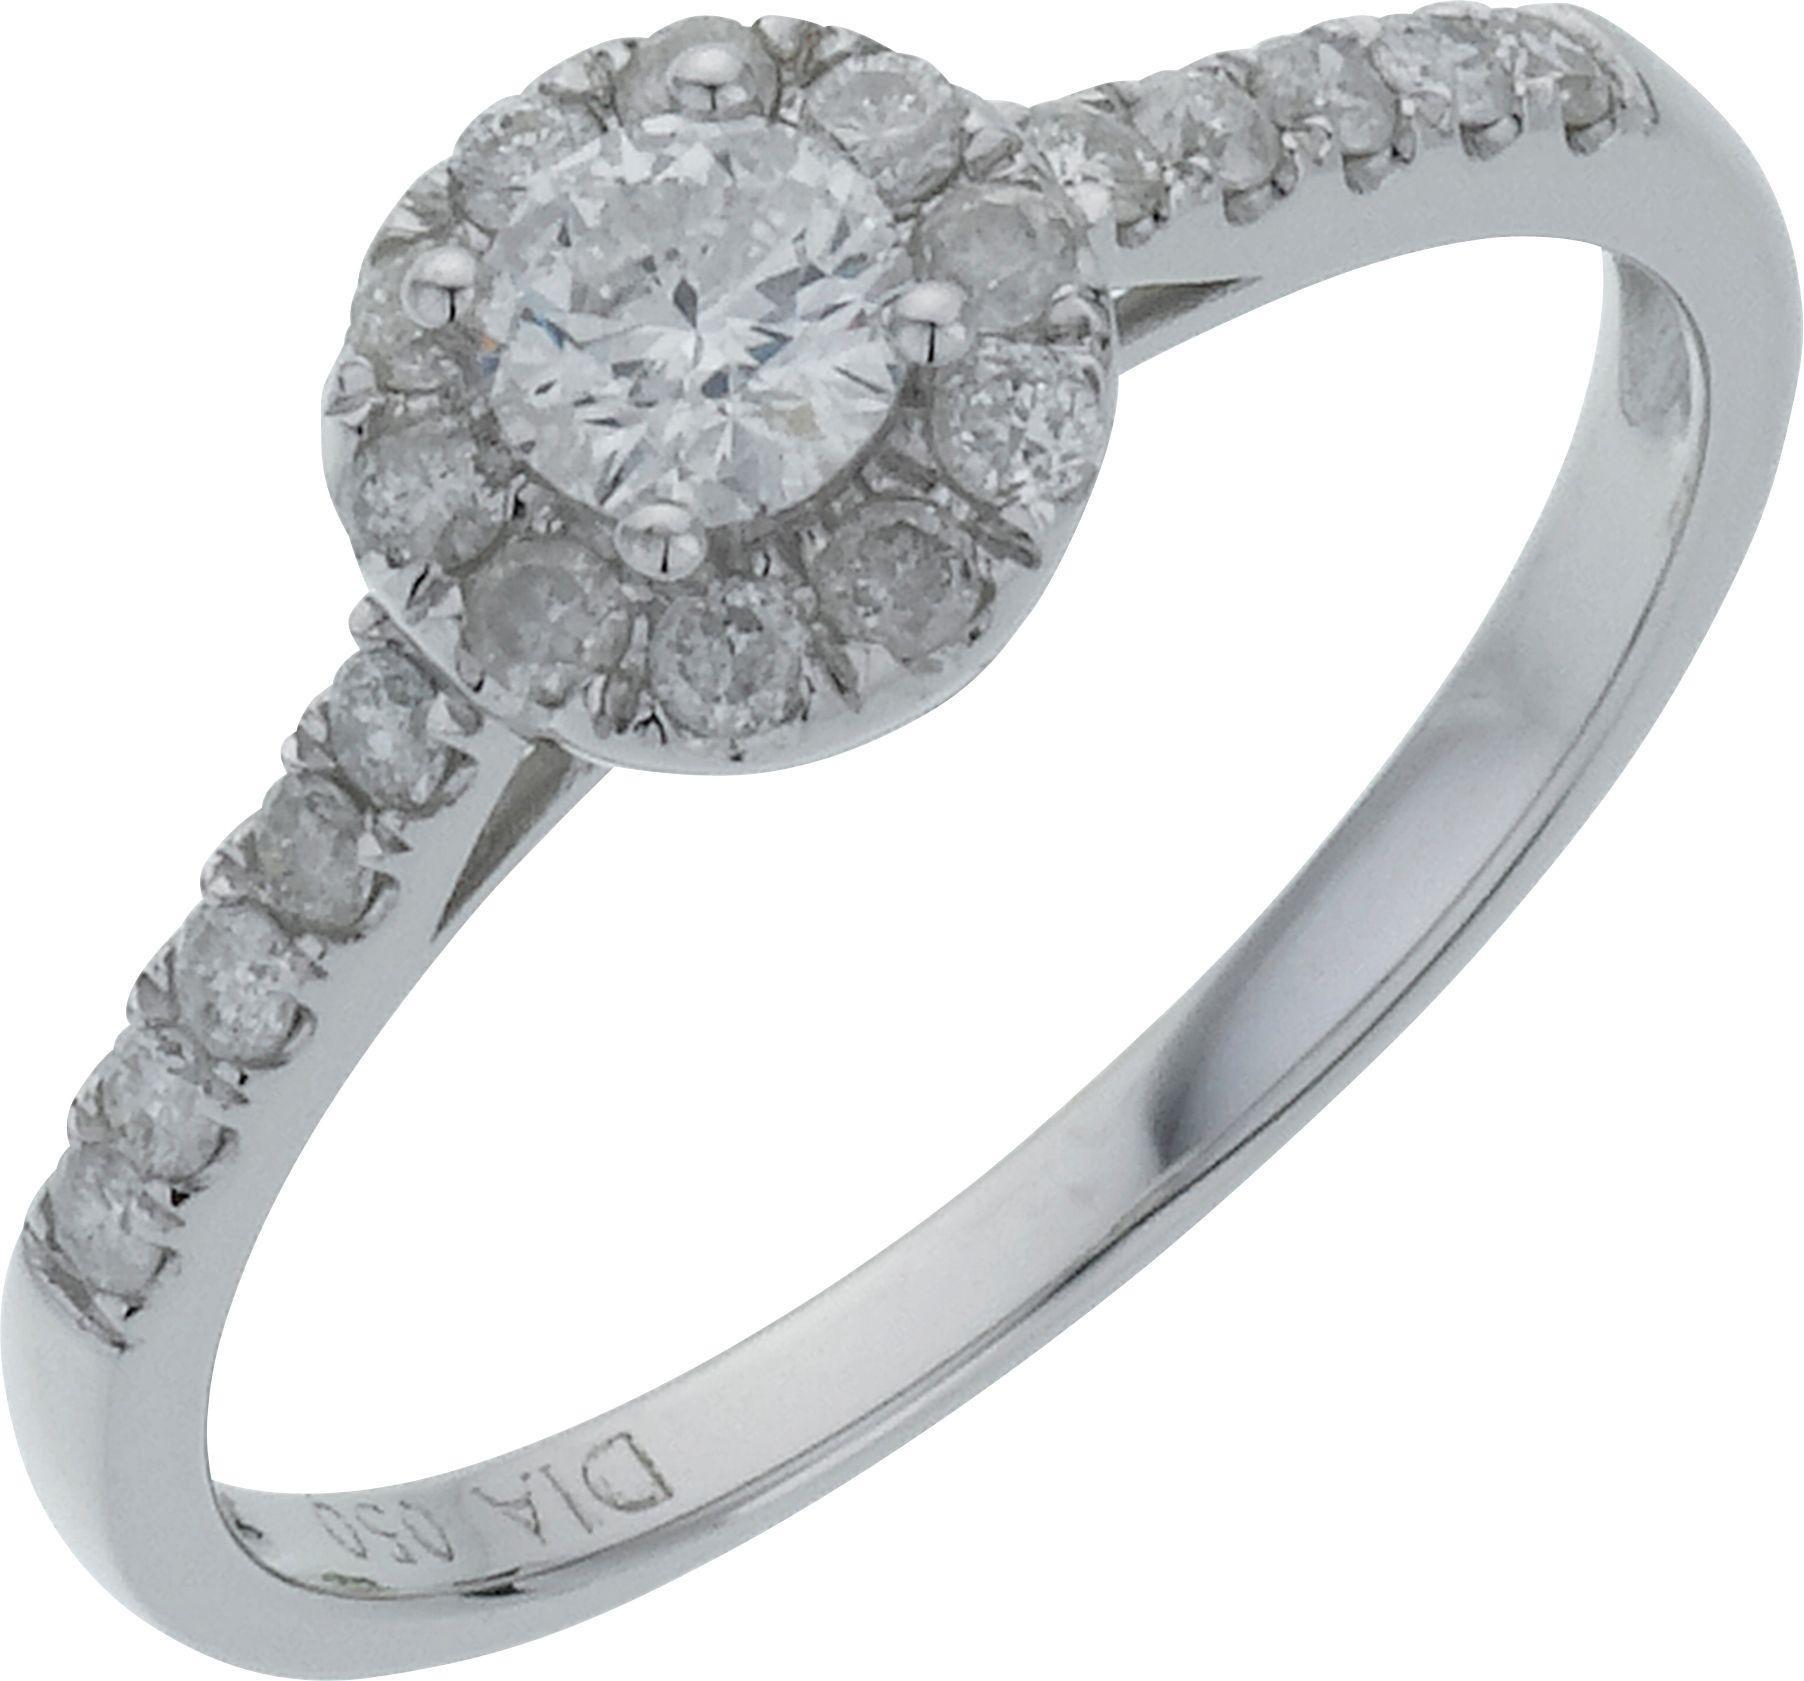 18ct White Gold Round Diamond Halo Ring - Size P